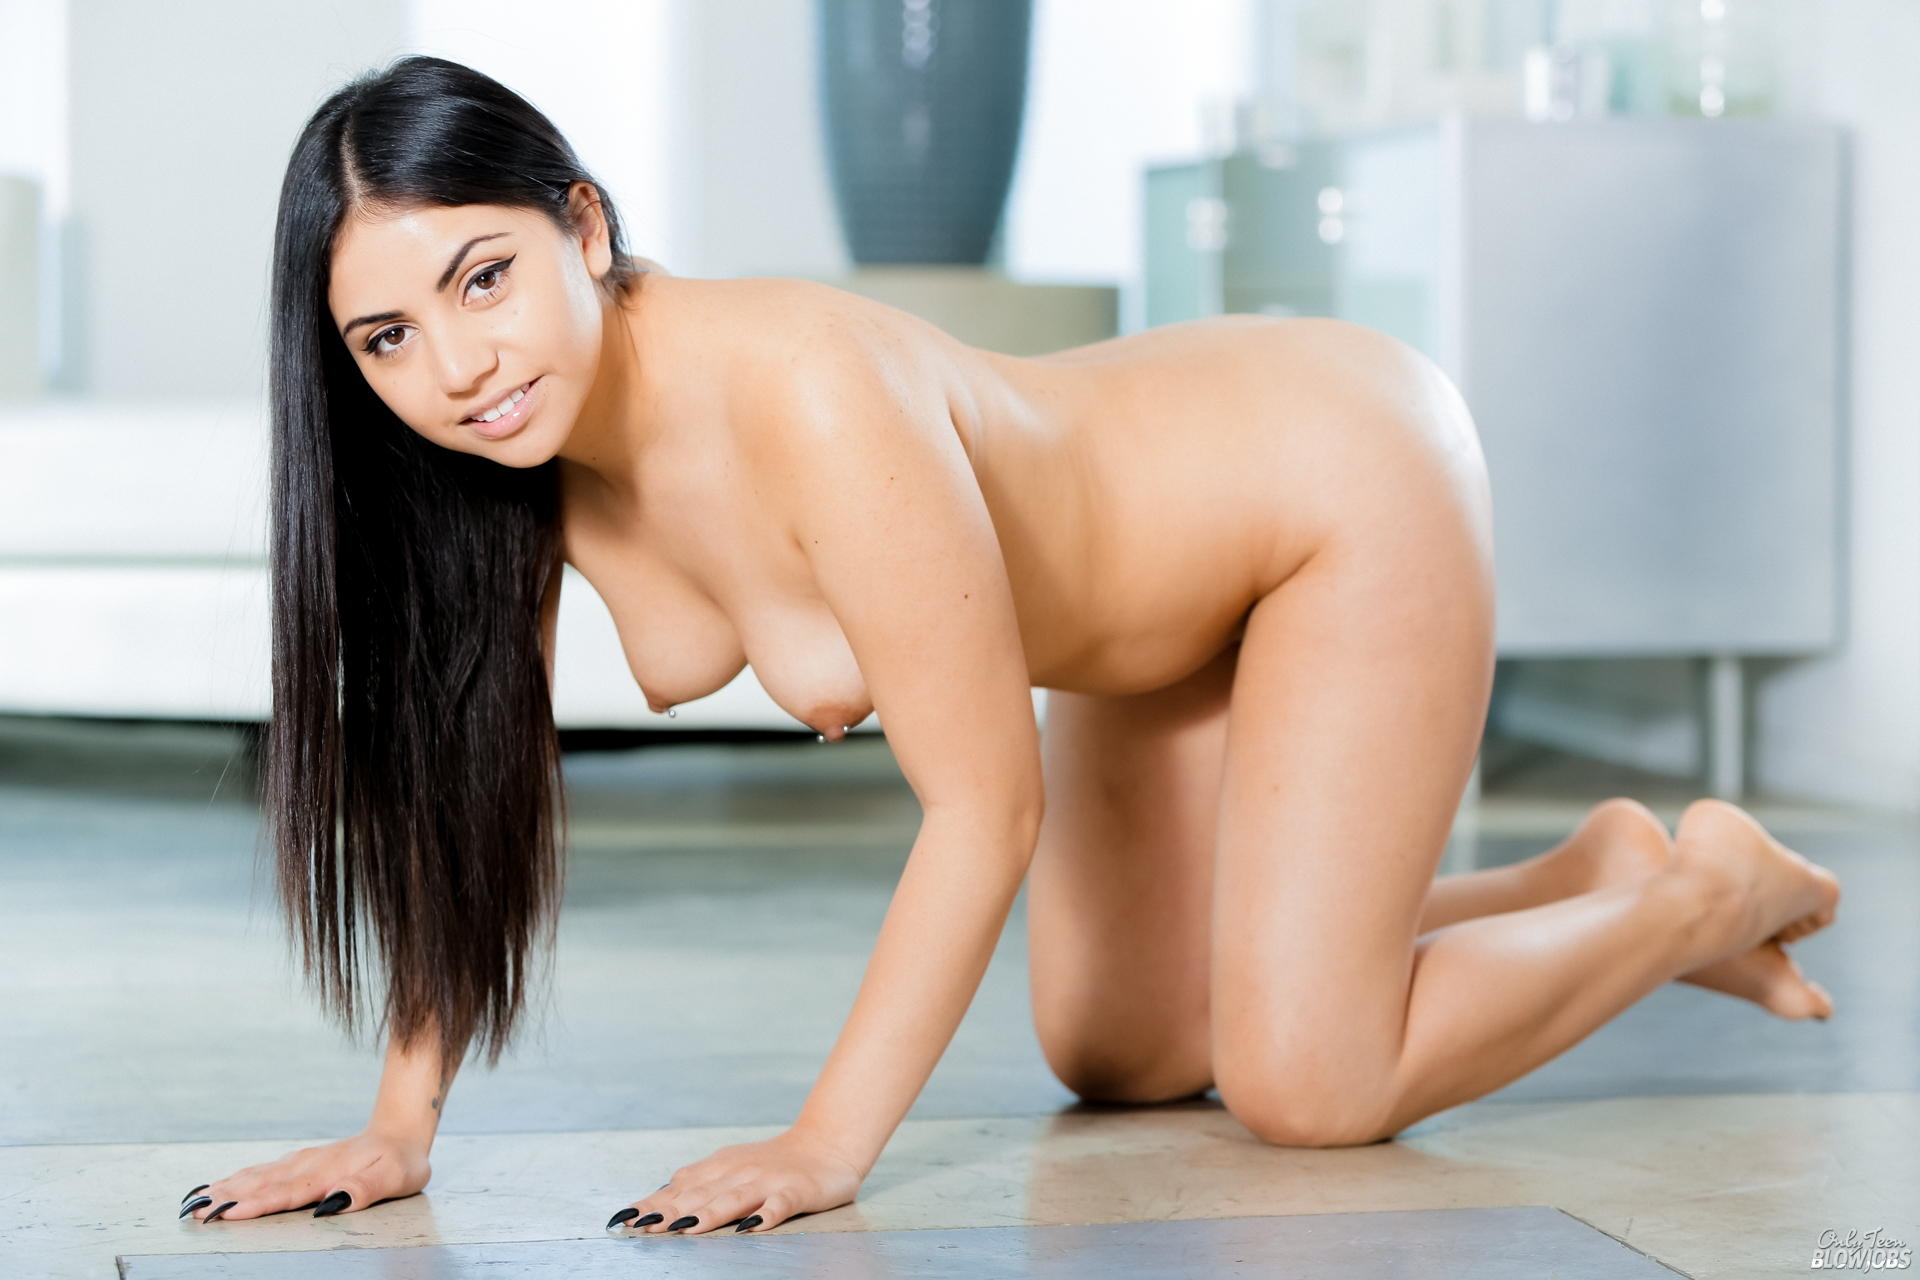 blazingmovies pic teasers 92765 cdc481893c nude 01 92765 05